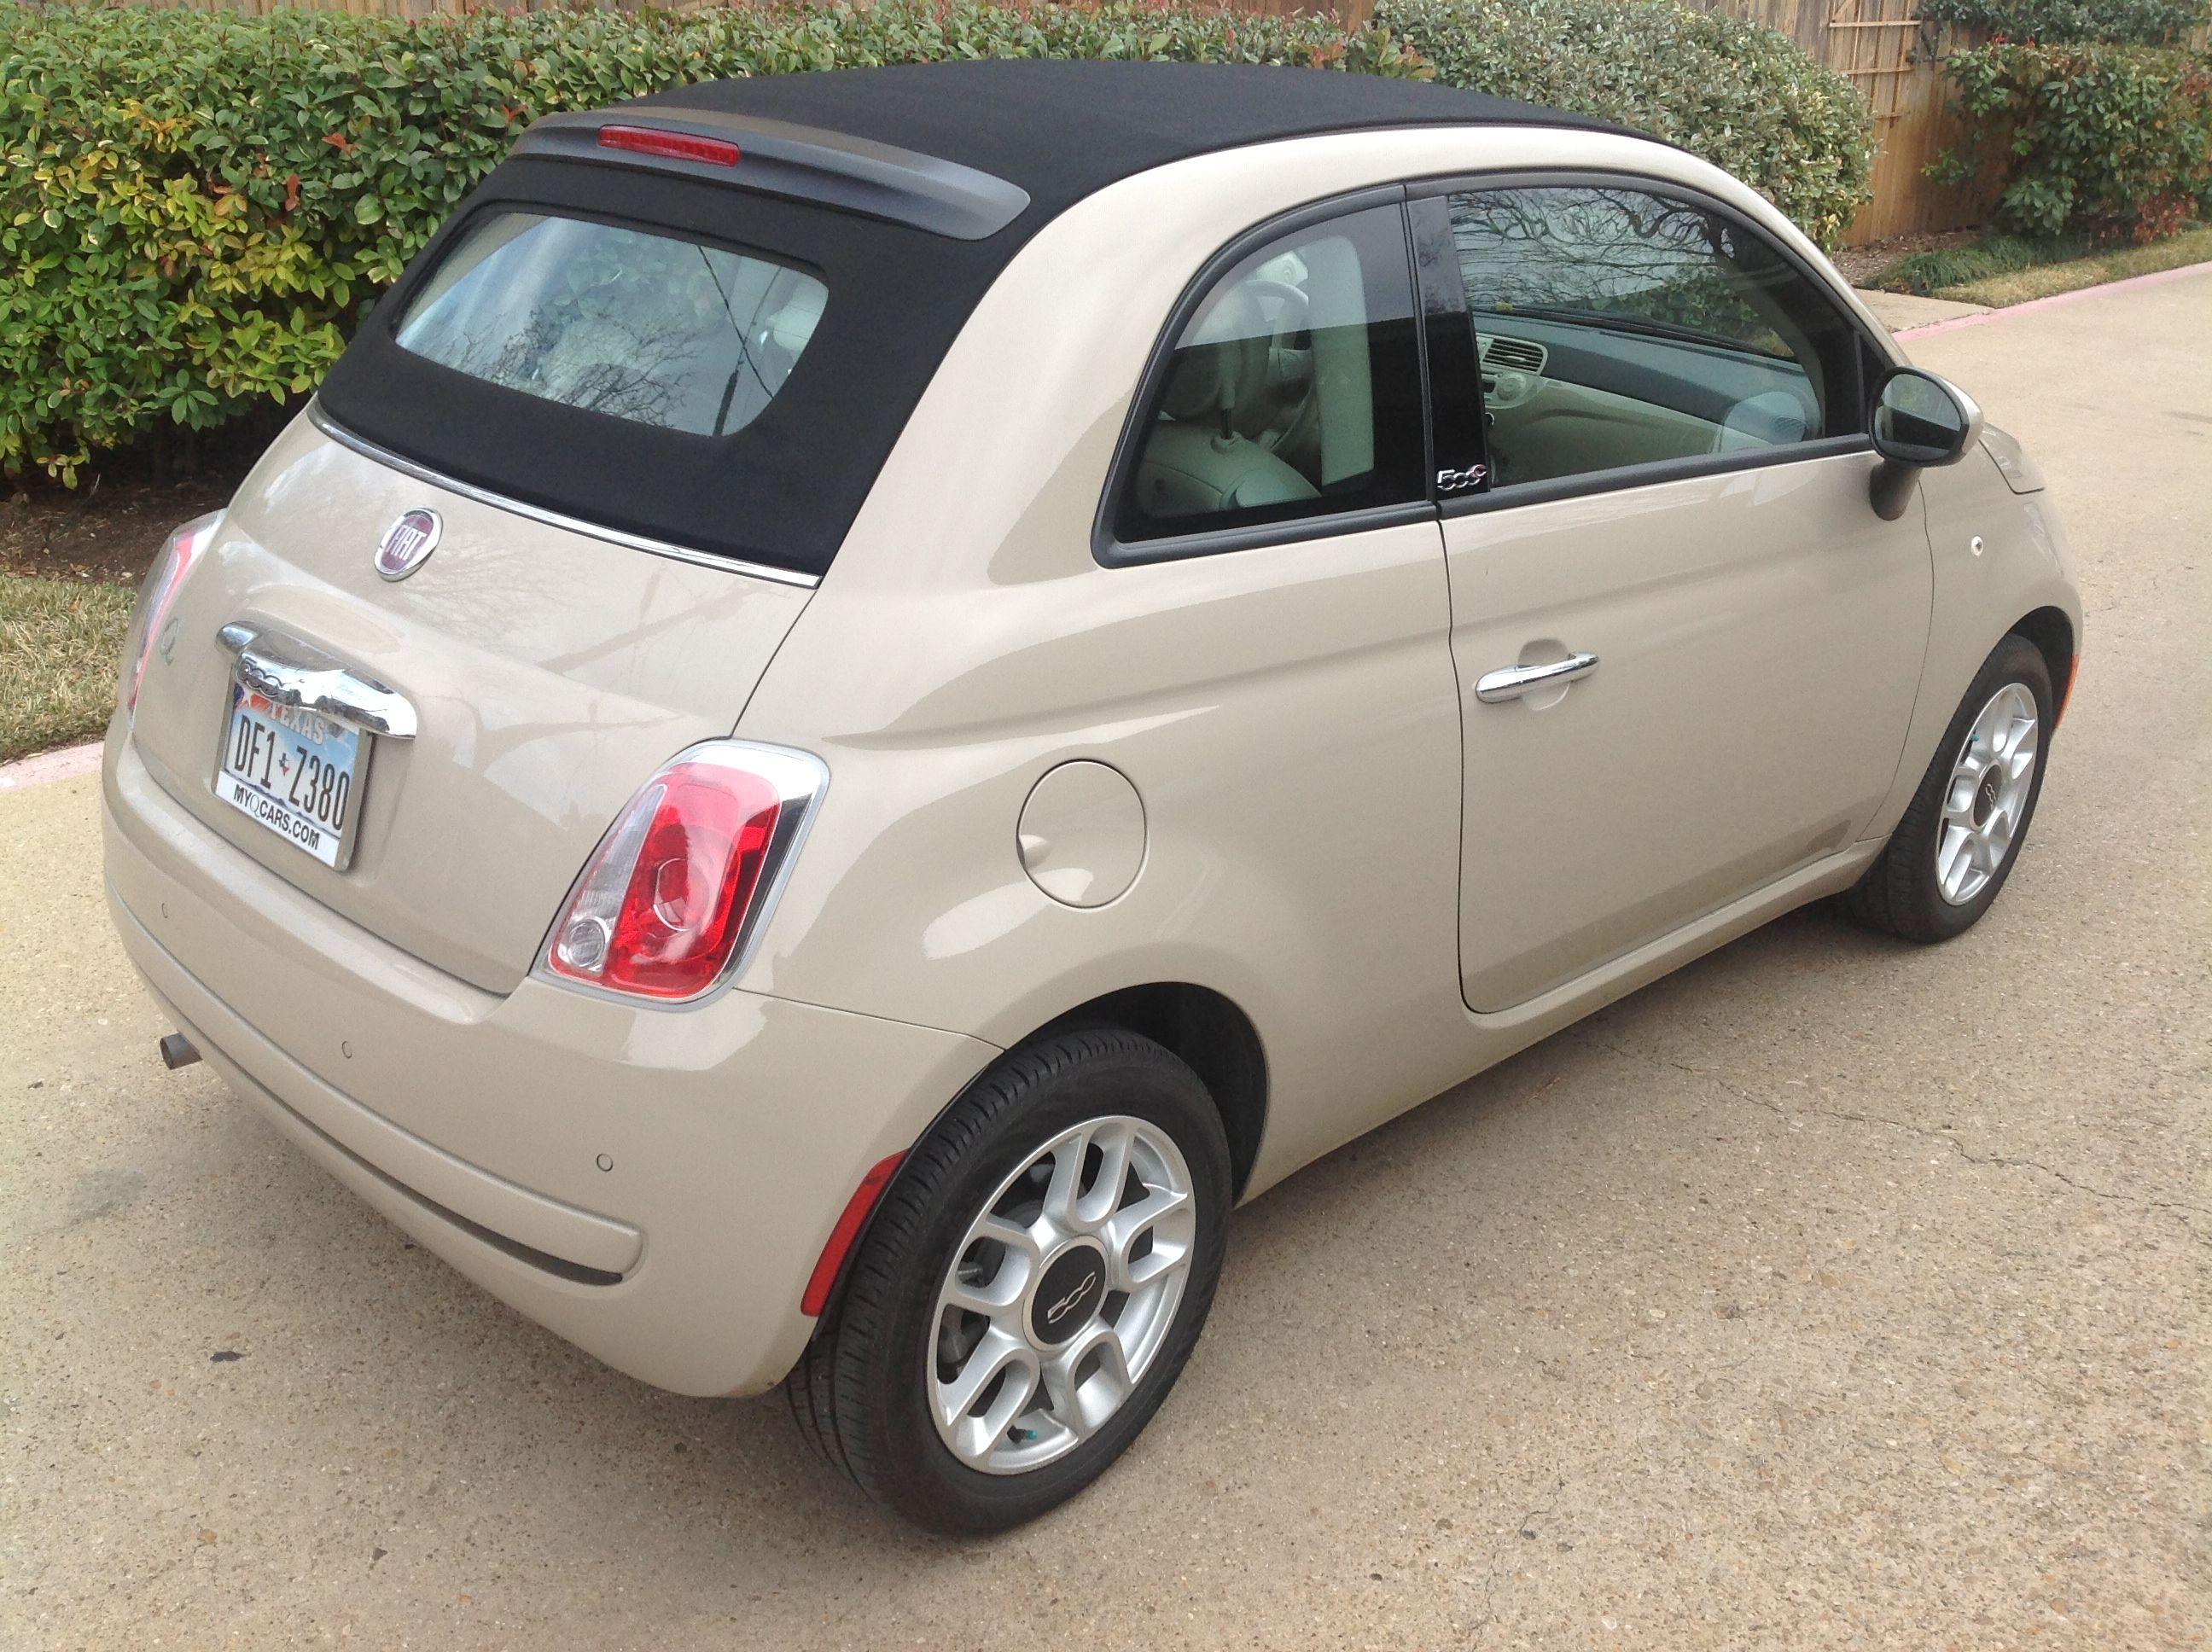 Ca car color beige - 2012 Fiat 500c Mocha Latte Love The Italians